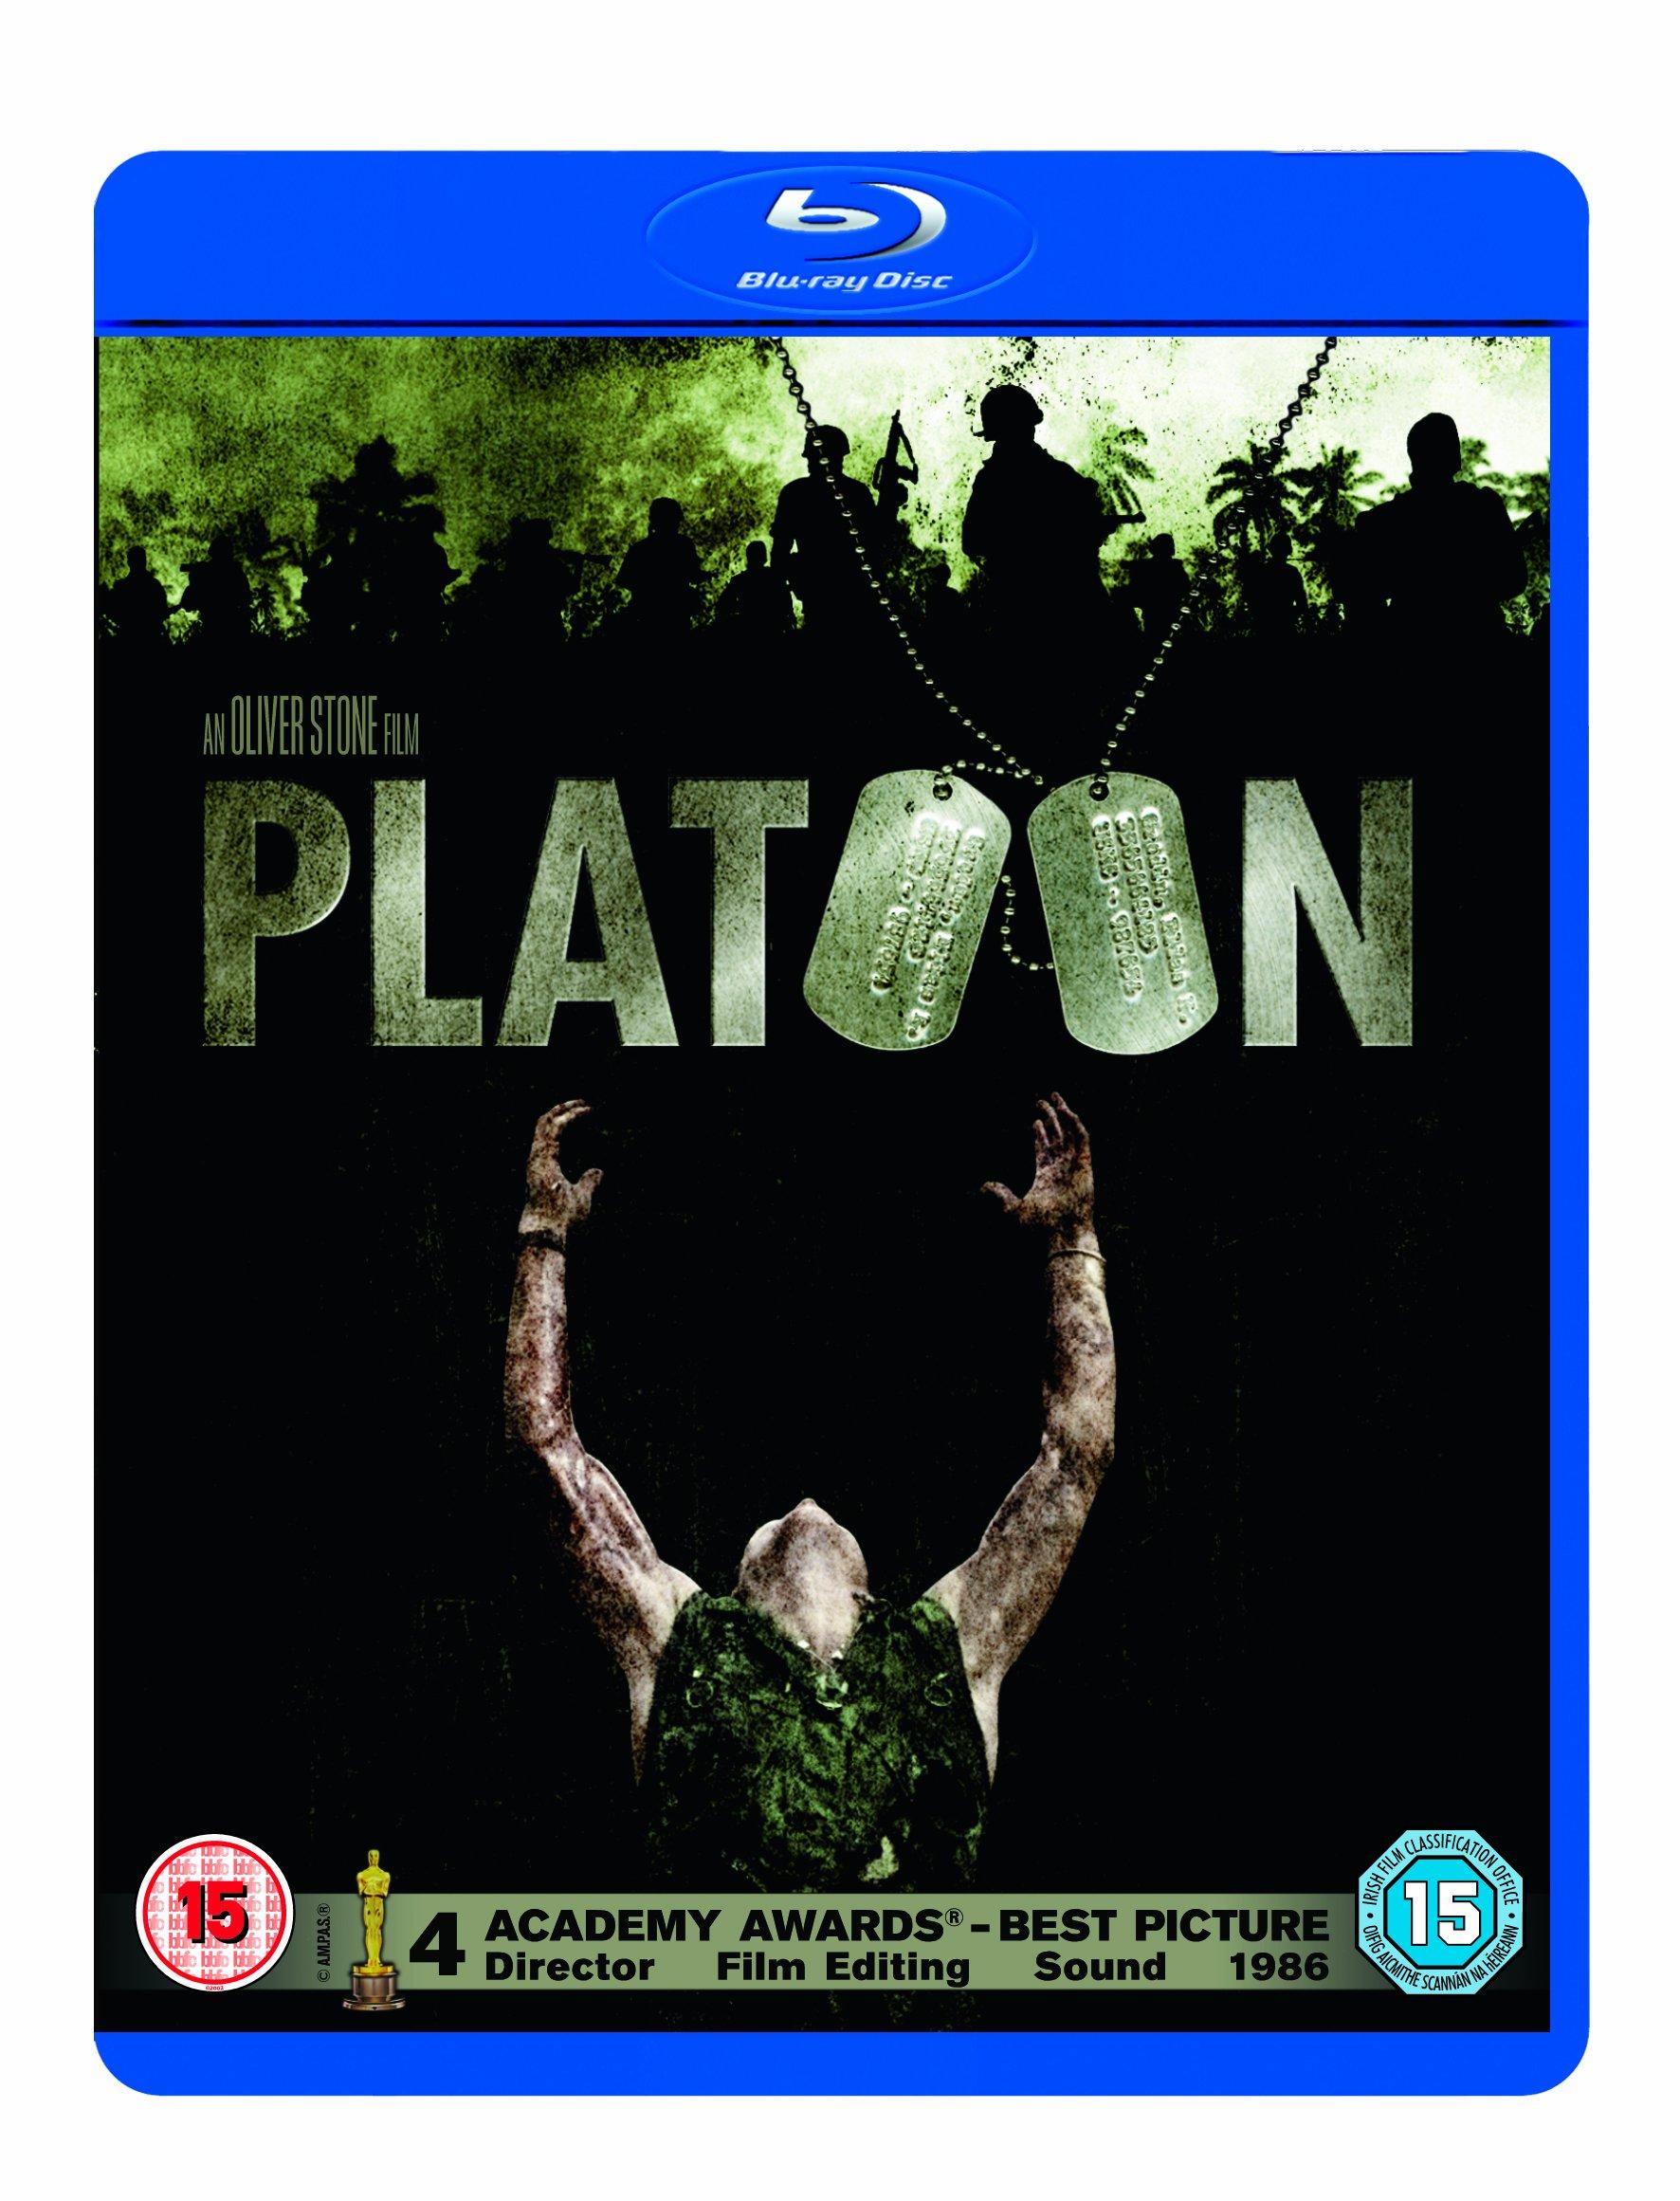 Platoon [Blu-ray] [1987] [1986]